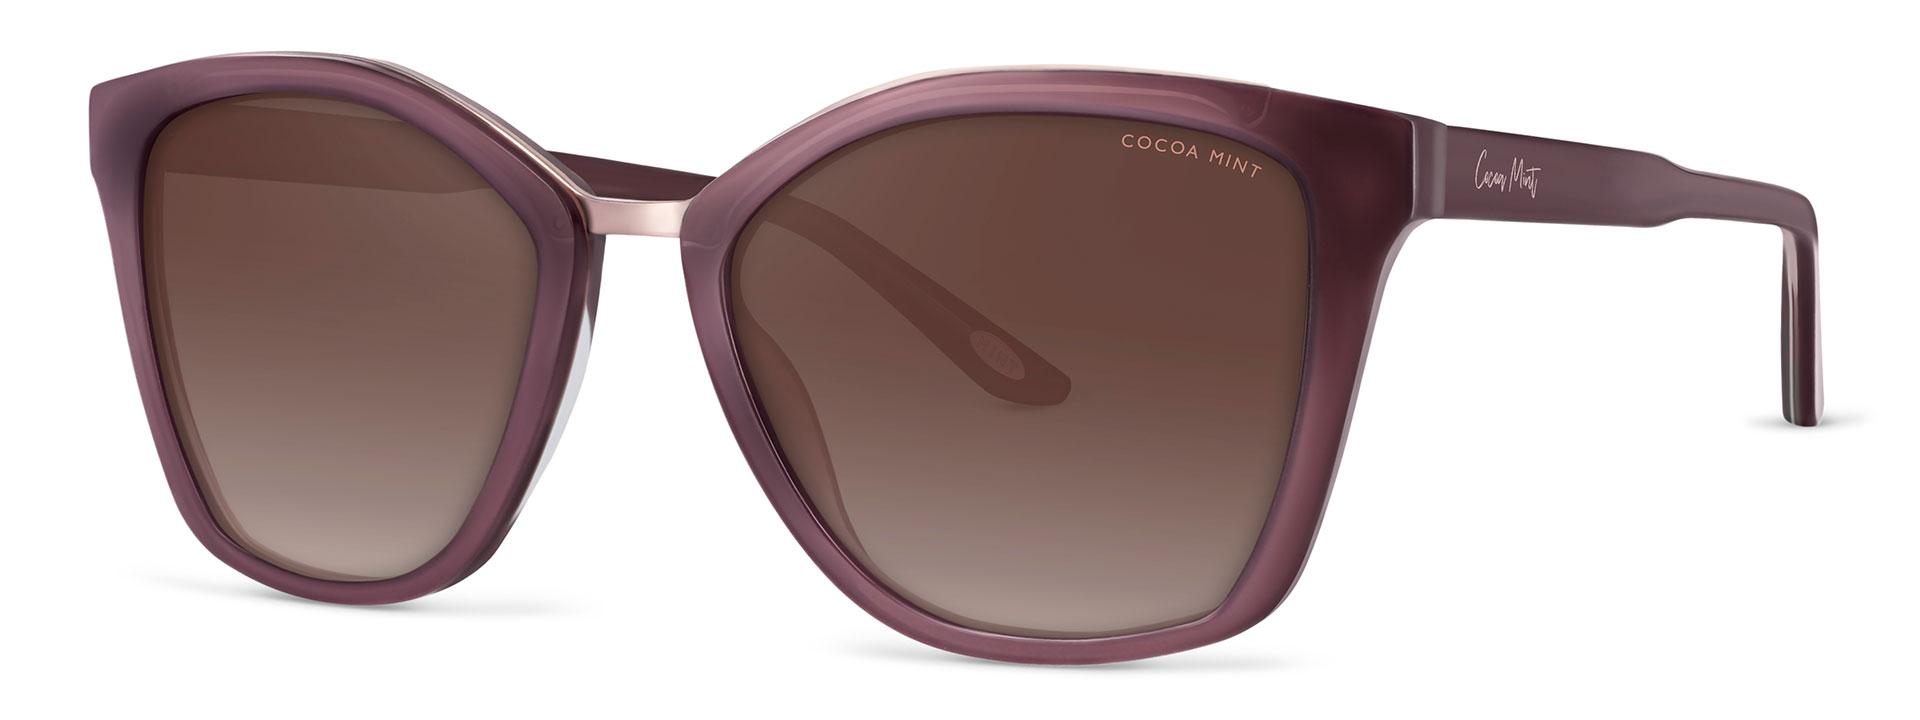 Cocoa Mint Sun Glasses - Taupe - CMS2072-C1